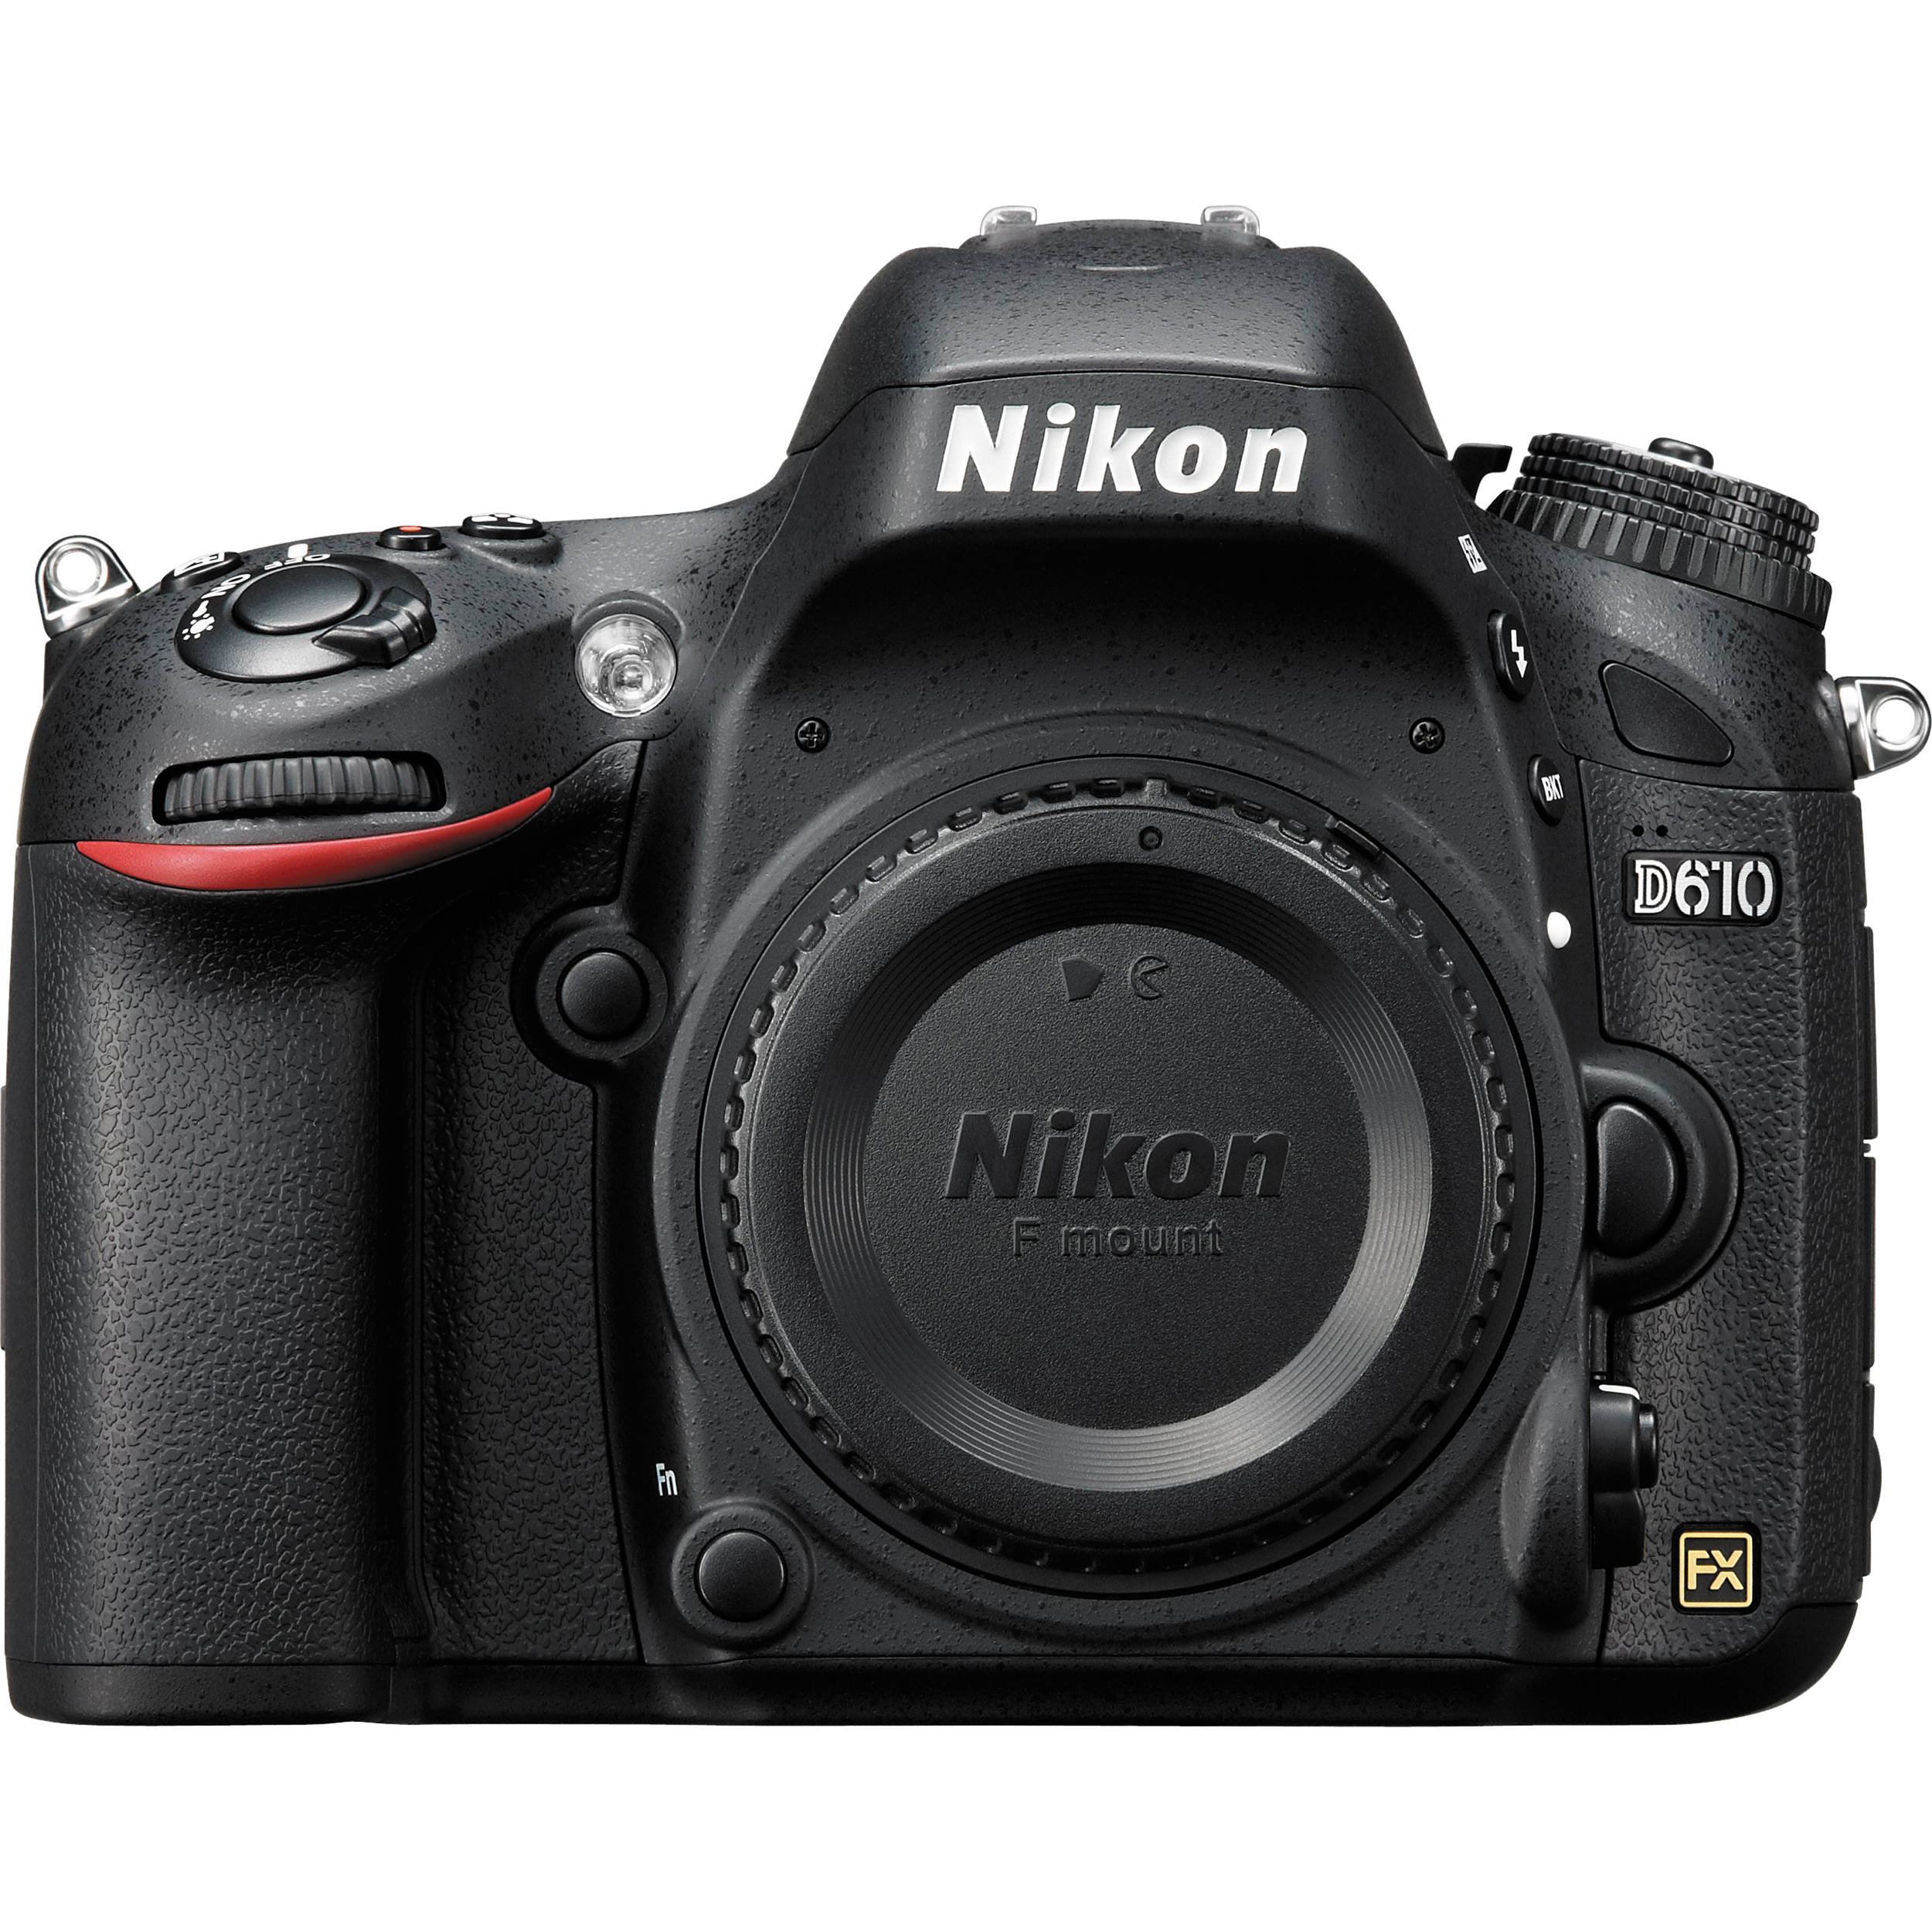 nikon d610 specs 1 image